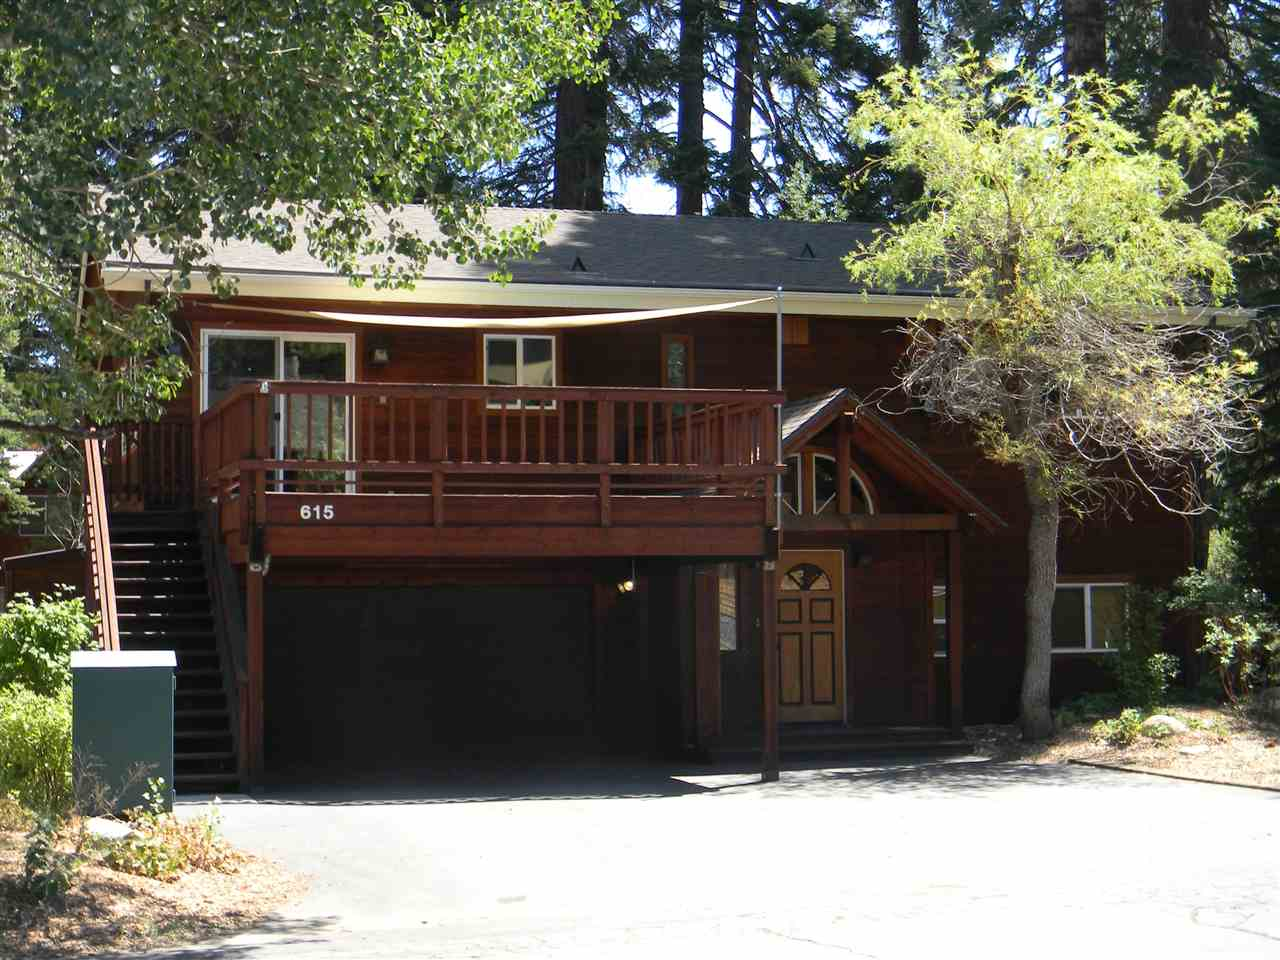 615 Rawhide Drive, Tahoe City, CA 96145